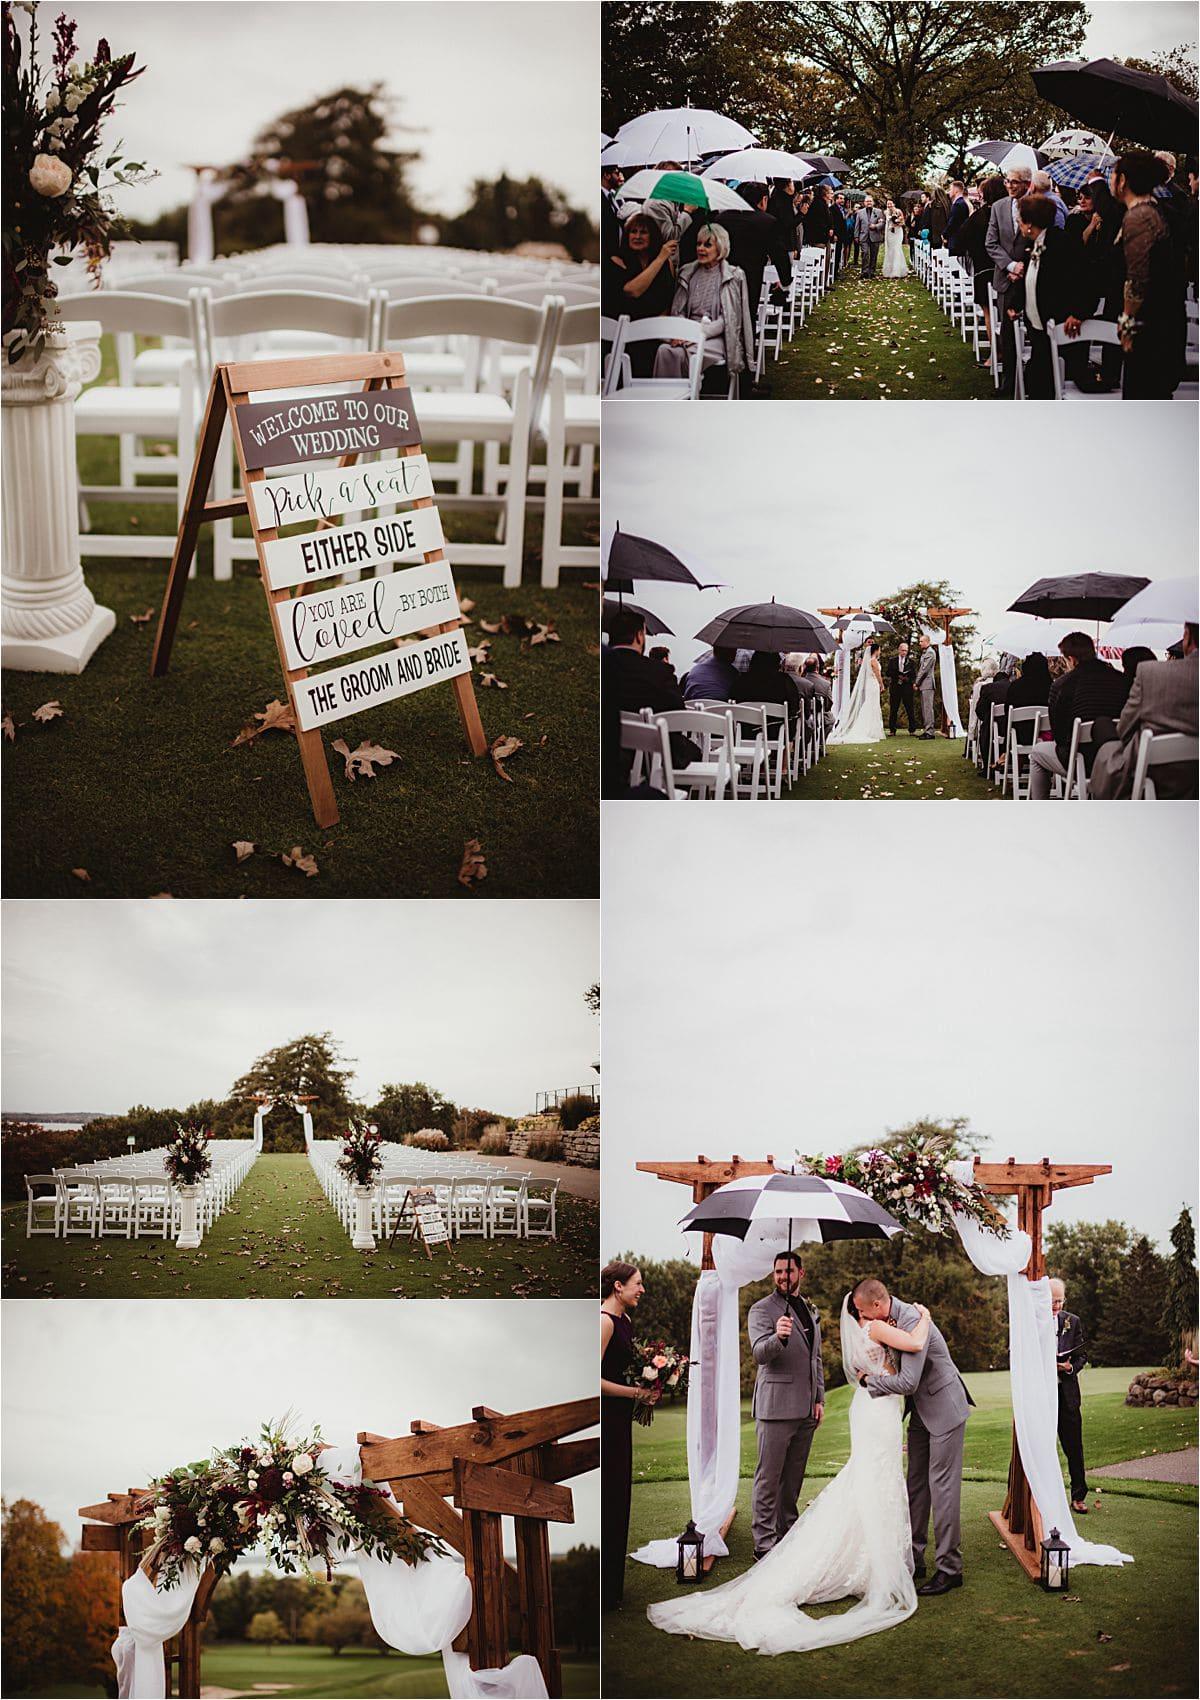 Rainy Day Wedding Ceremony Details